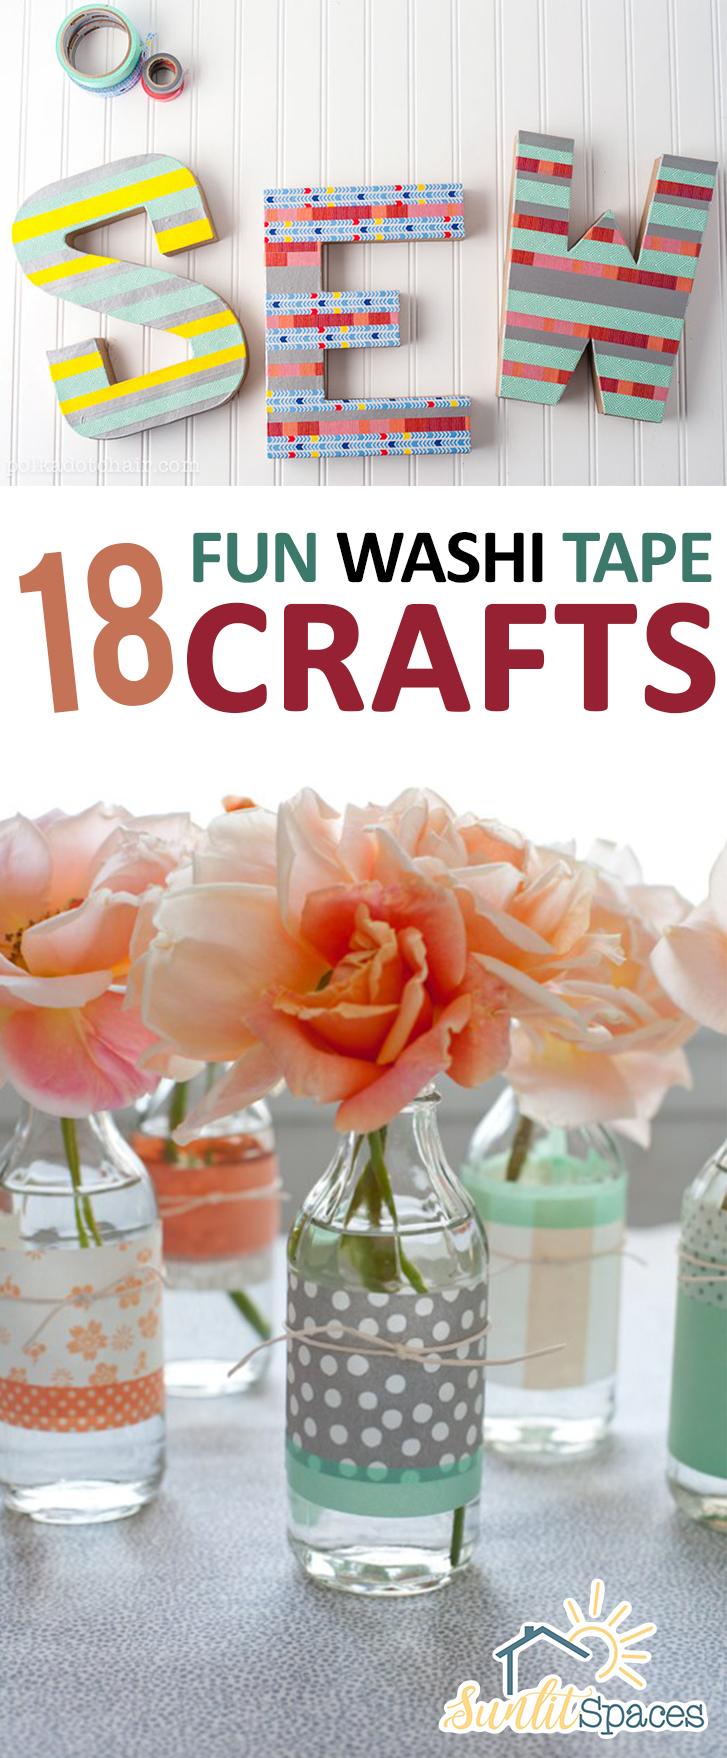 Washi Tape Crafts, Fun Craft Projects, Fun Washi Tape Craft Projects, How to Decorate With Washi Tape, Easy Crafts, Easy Crafts for Less, Quick Crafts to Make, Popular Pin